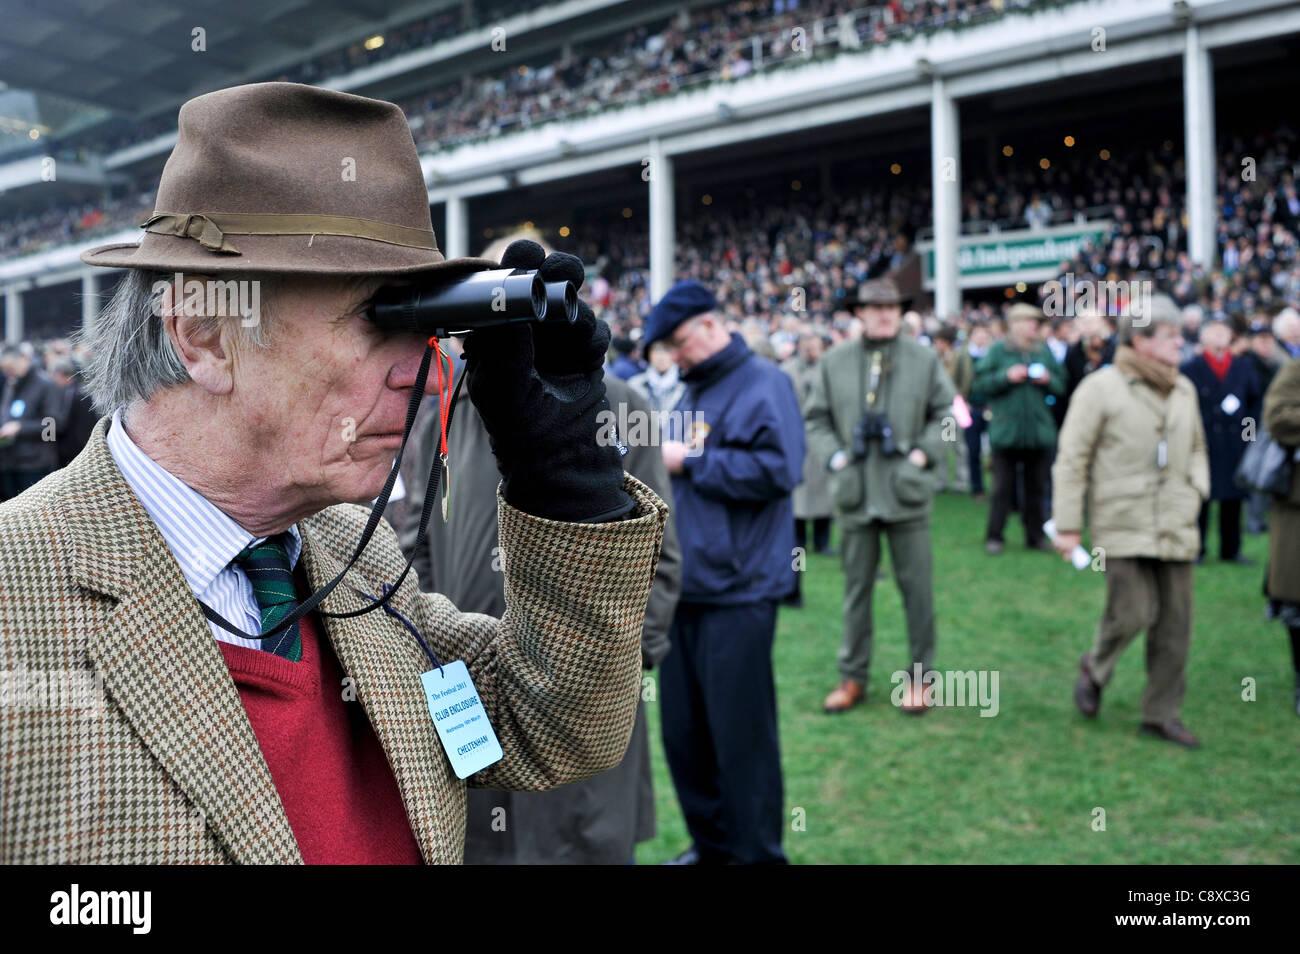 Elderly Man watching the horse racing at the Cheltenham Festival. England - Stock Image